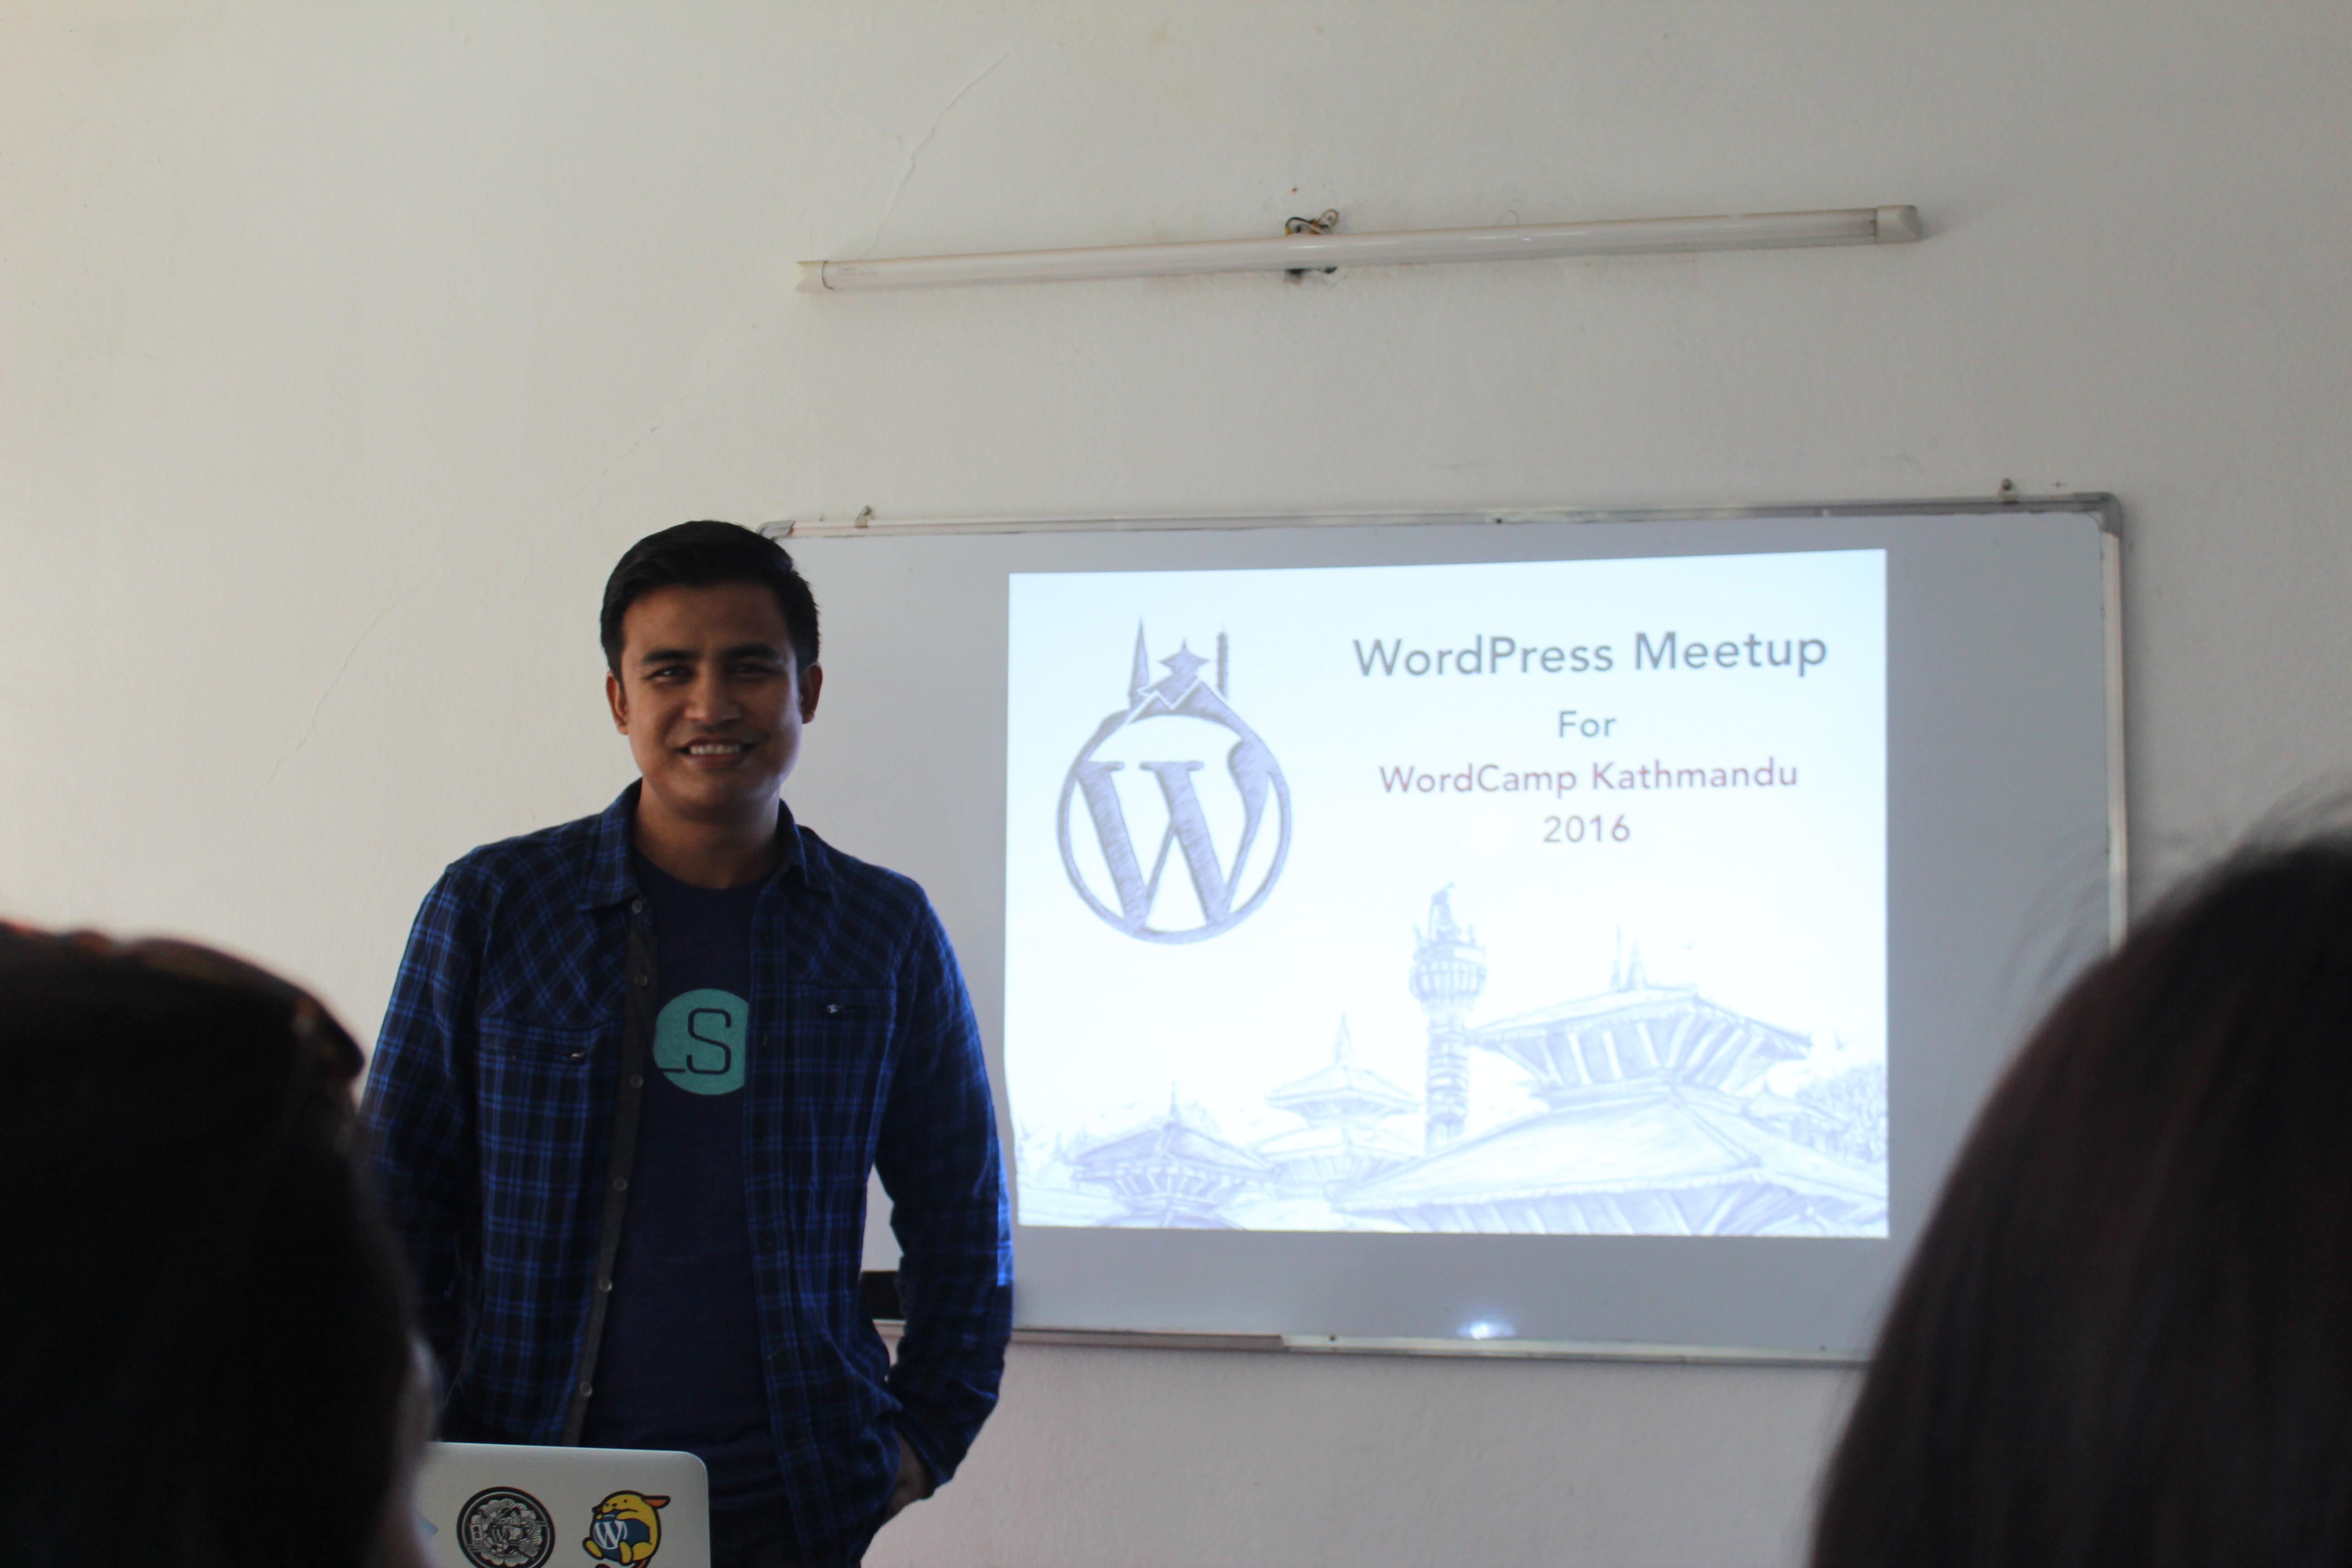 Sakin's presentation